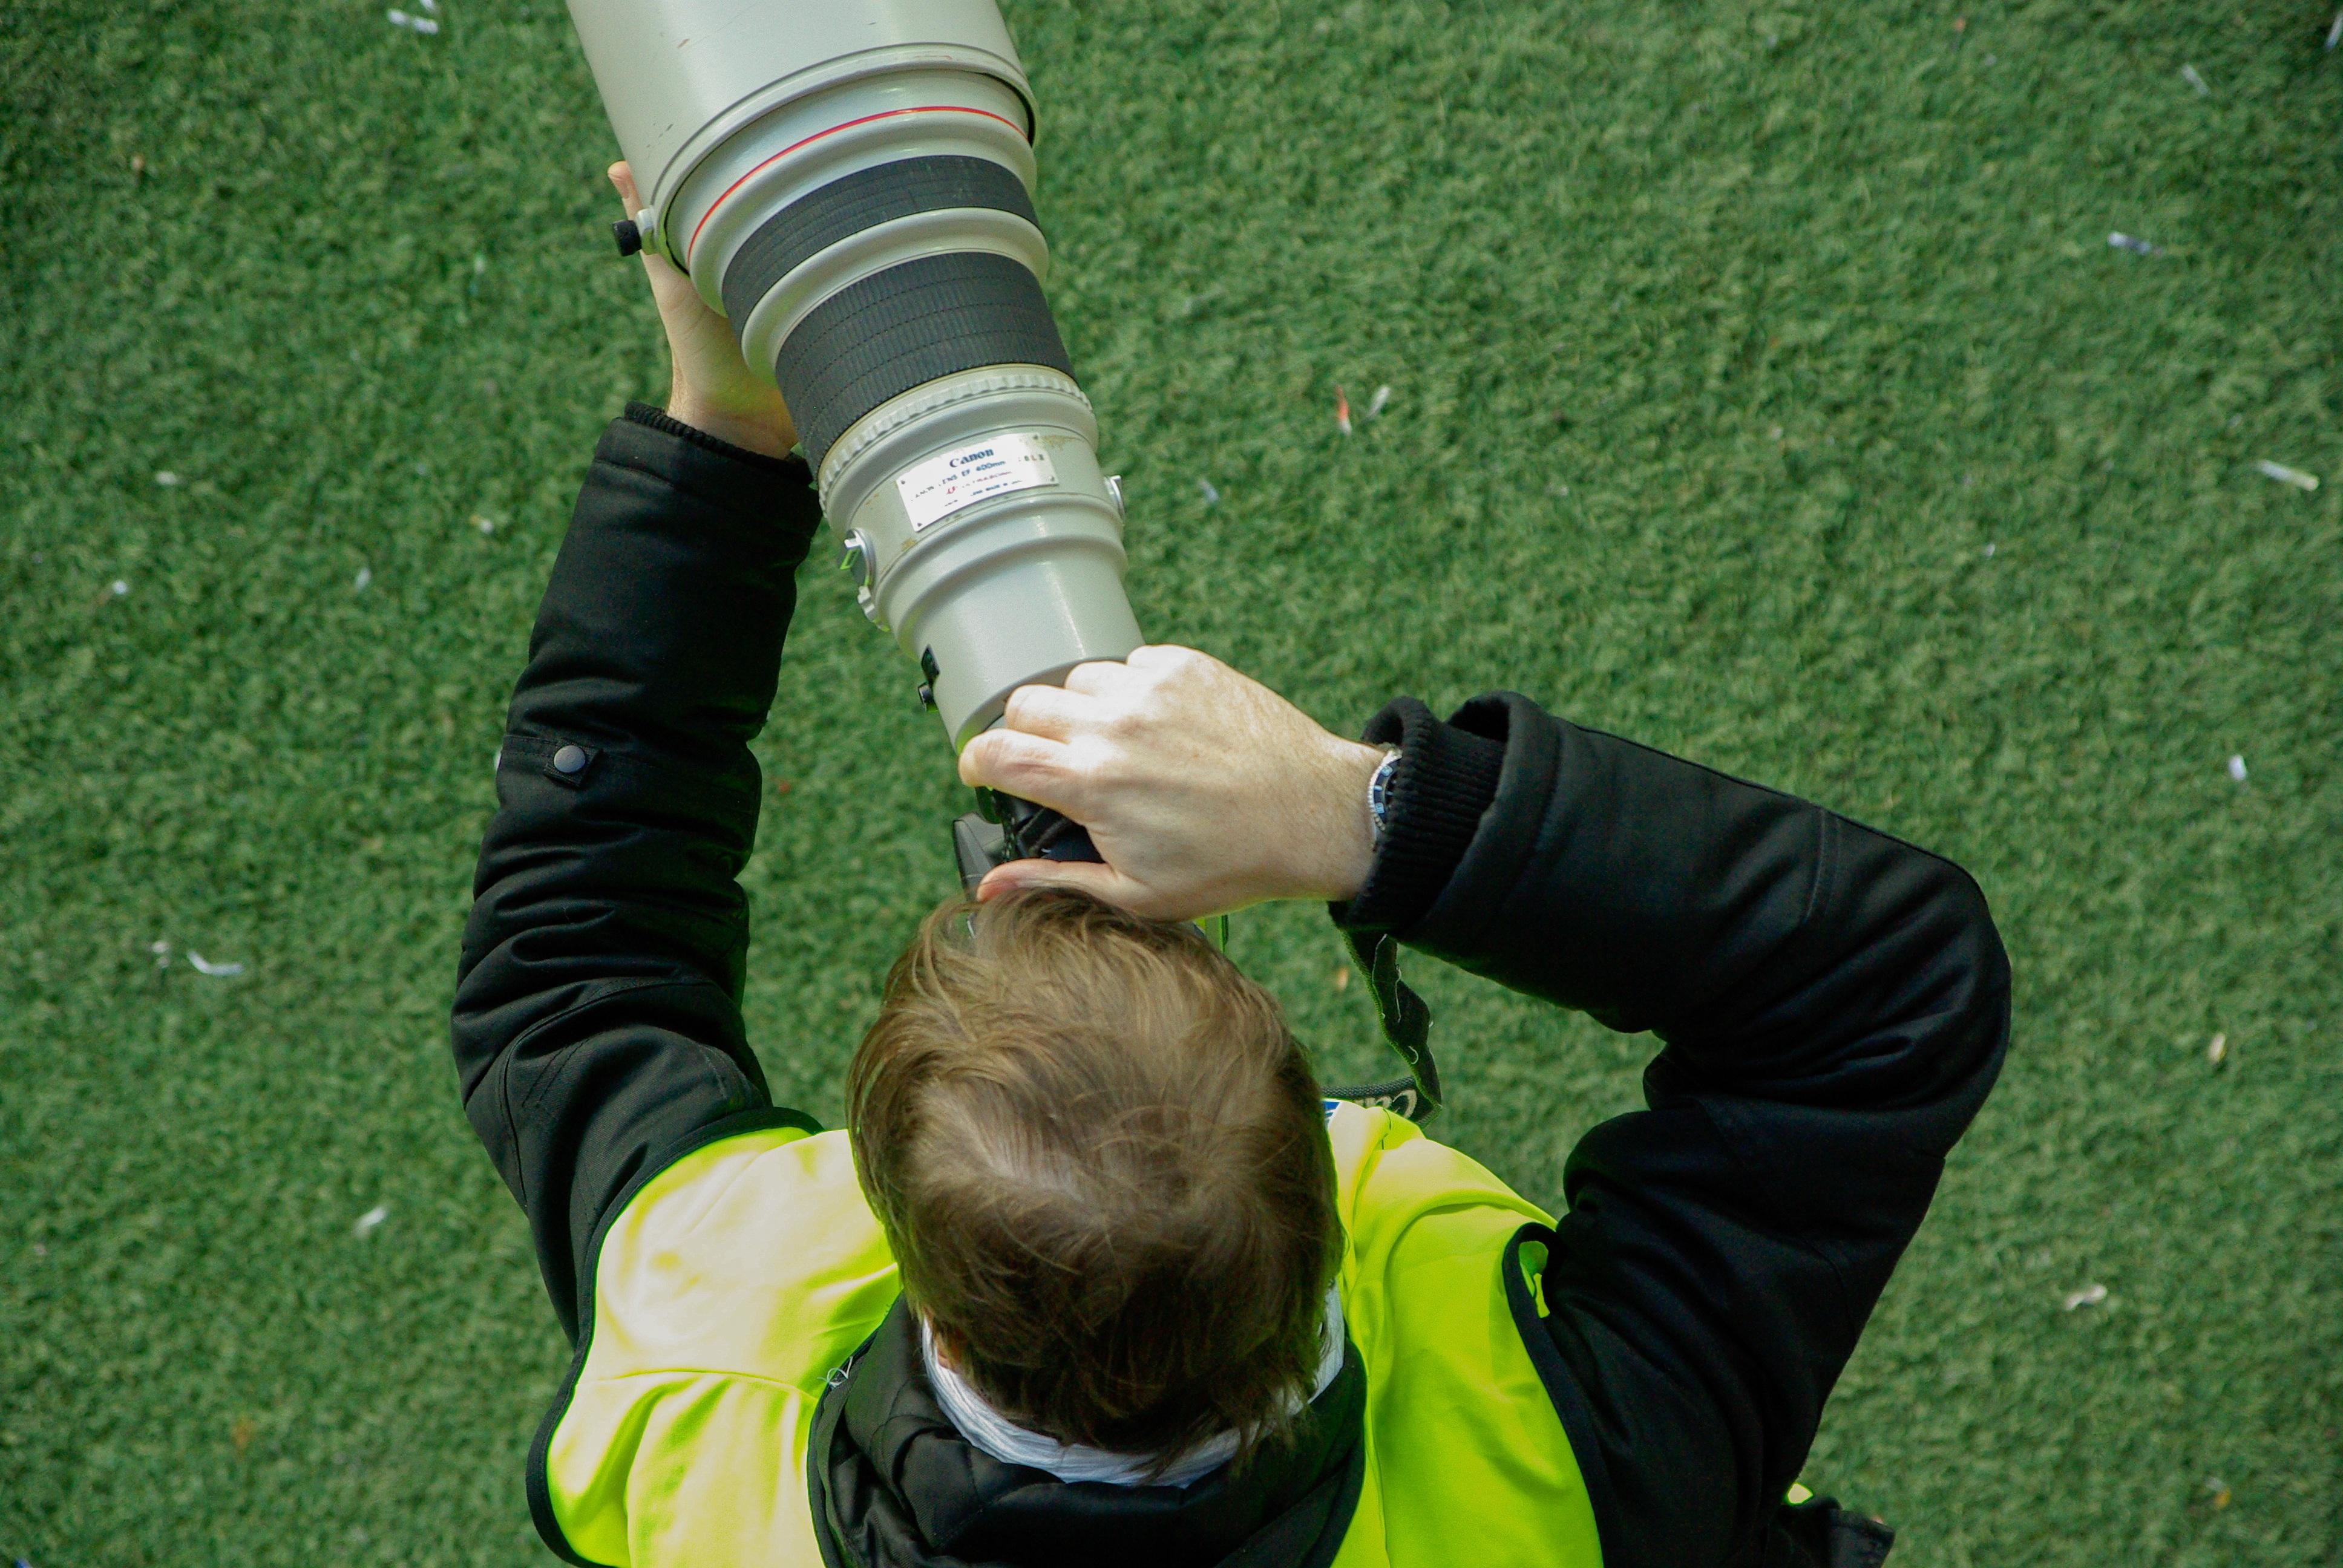 Kostenlose Foto Kamera Fotograf Grun Fussball Spieler